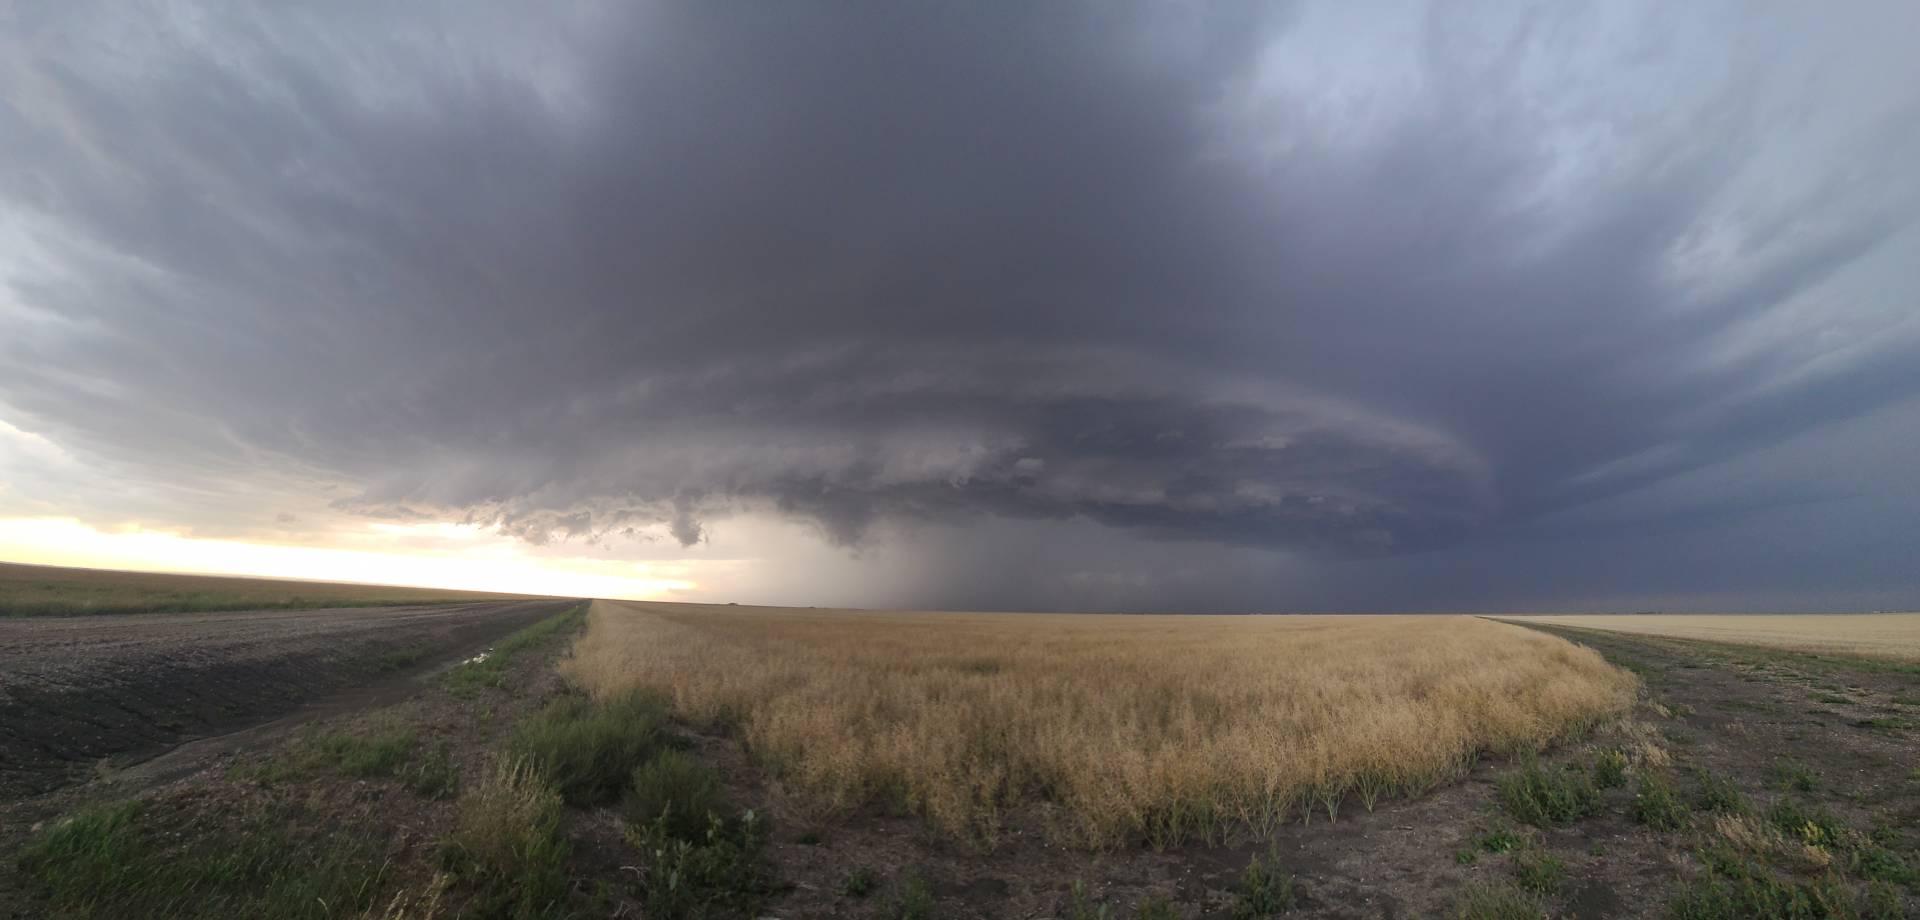 😍😍😍 SW of Pitman, SK #skstorm 6:28pm